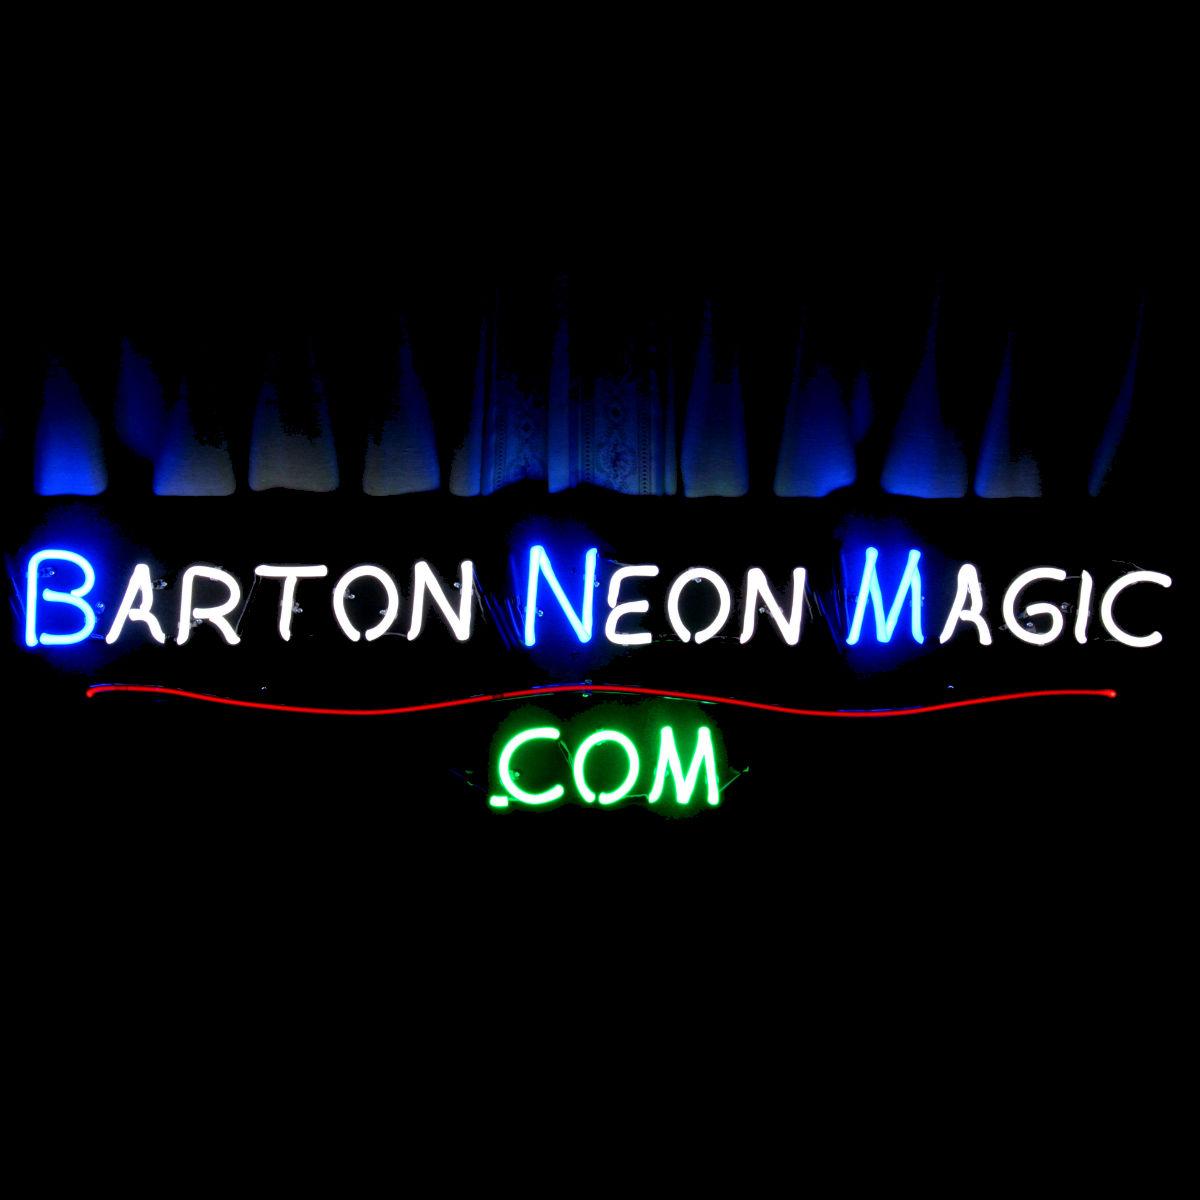 Sensational Custom Neon Artworks by John Barton - BartonNeonMagic.com